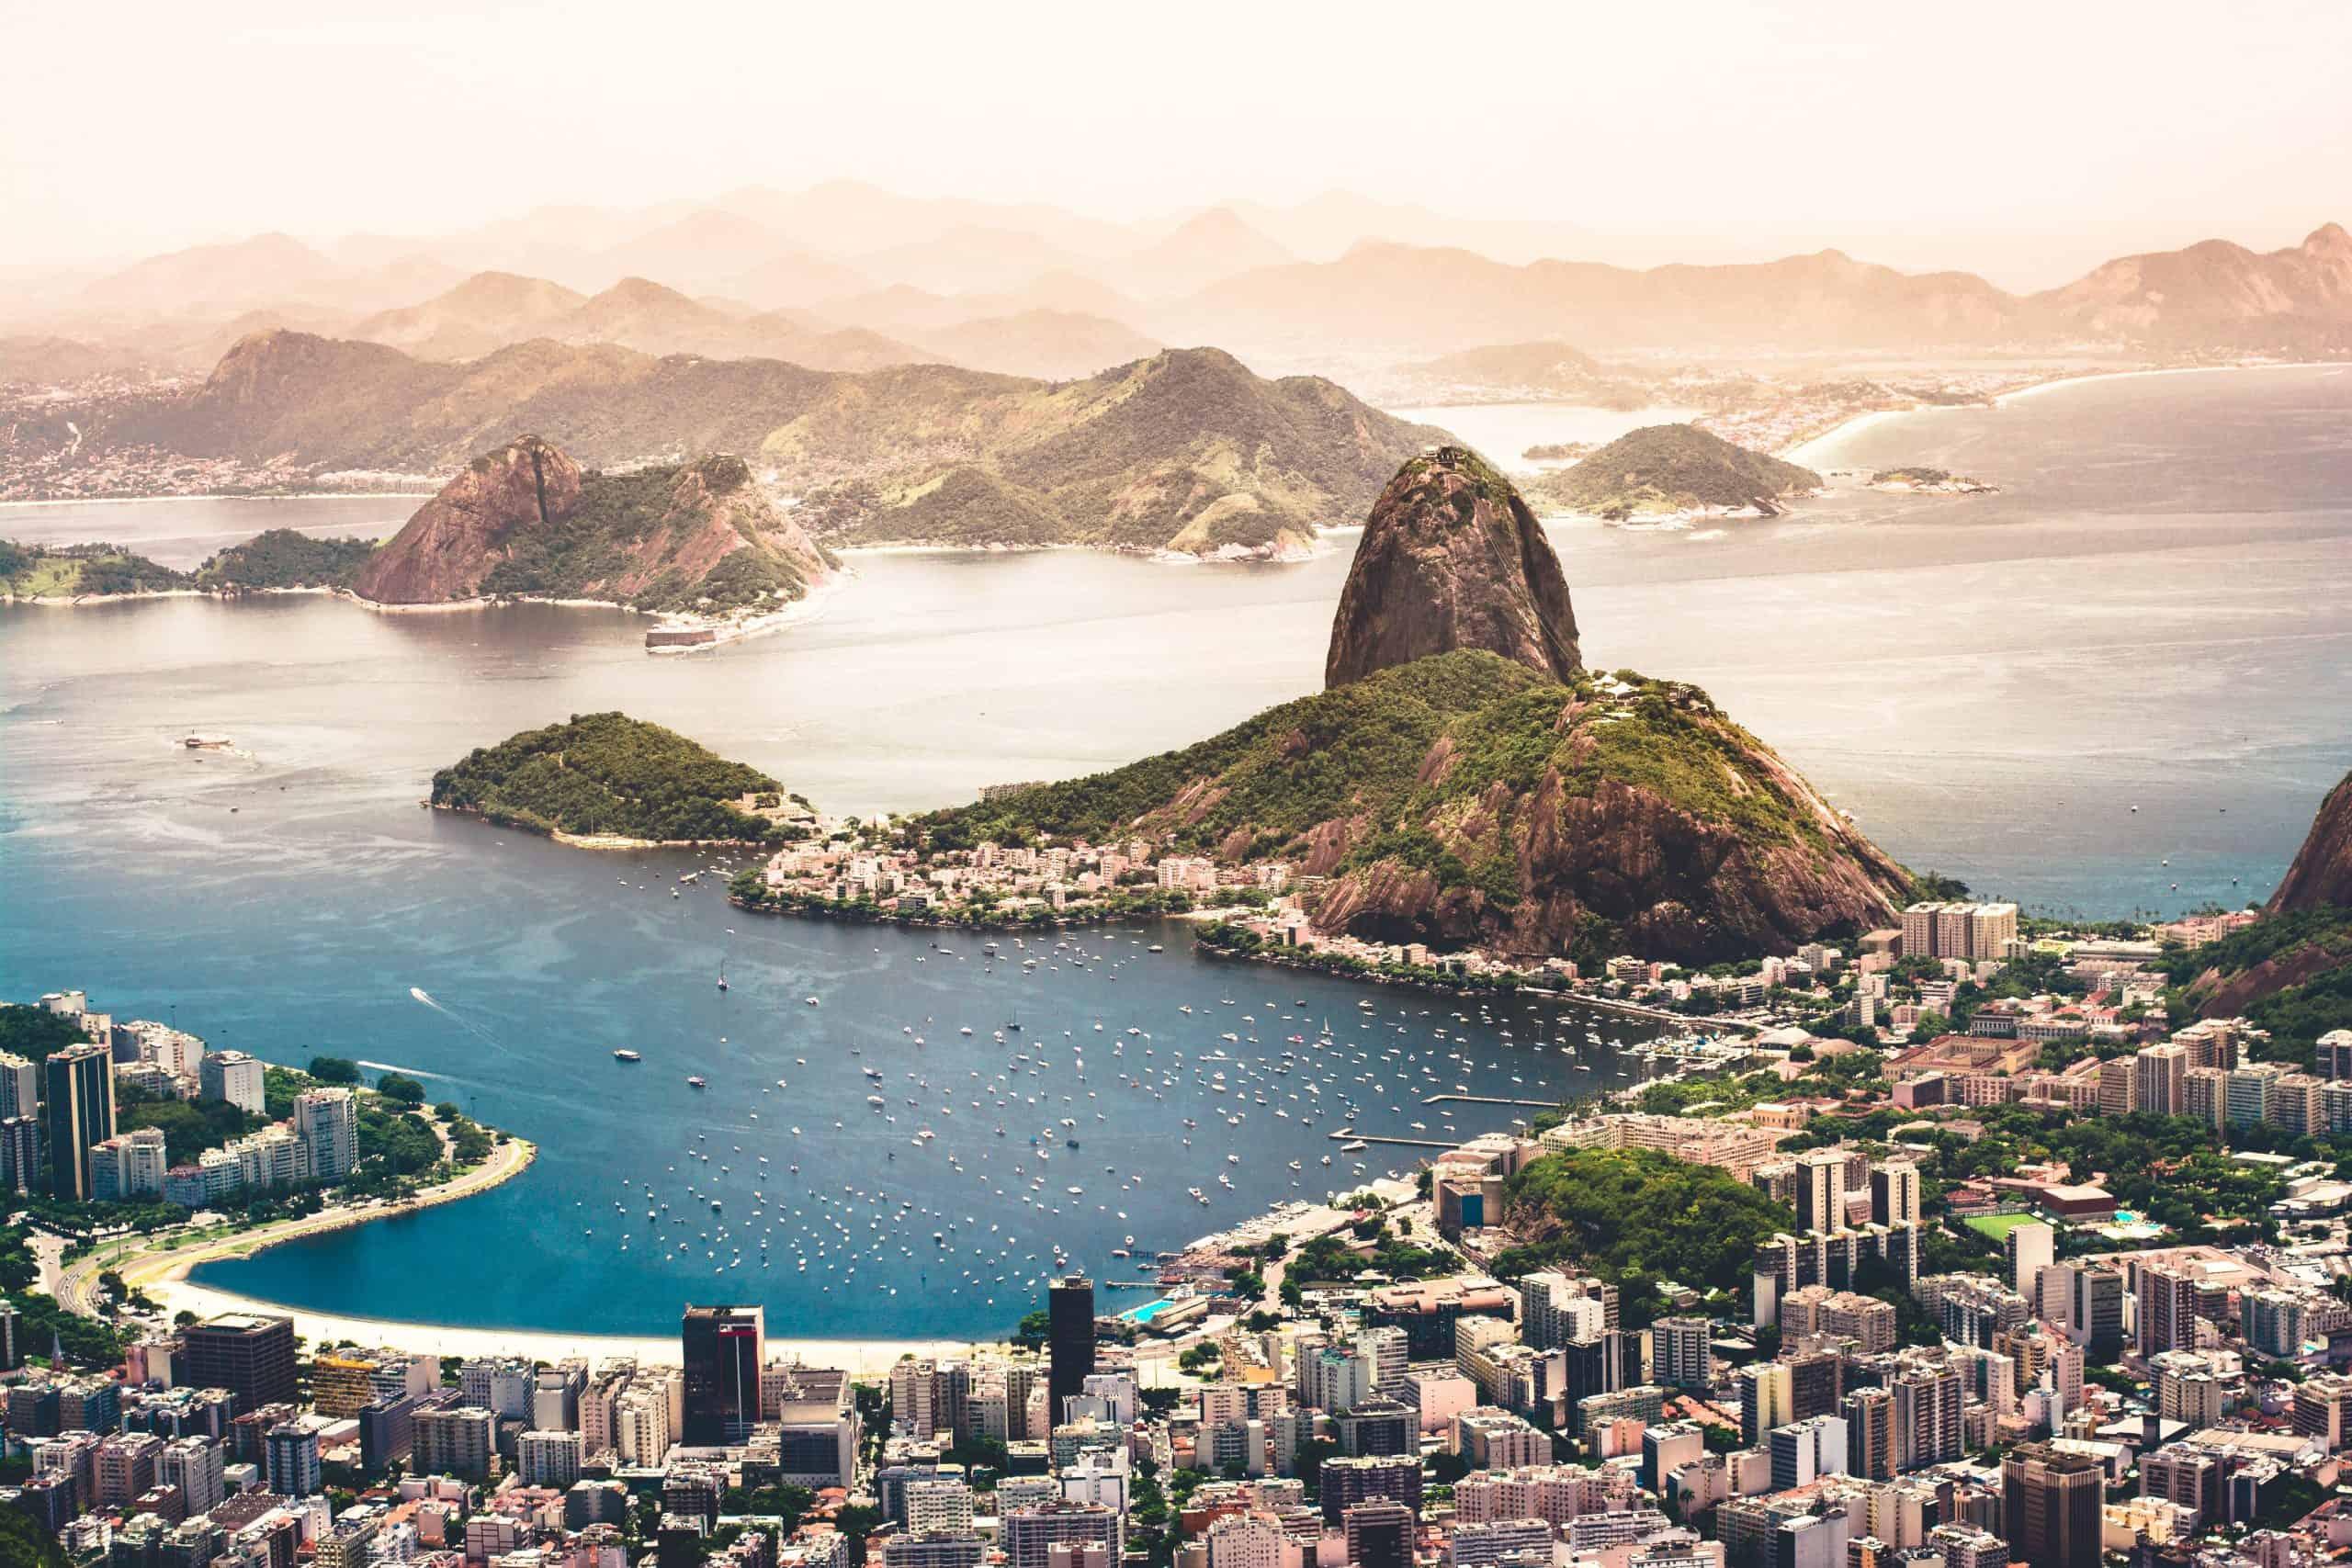 brazilian sim card, prepaid sim card brazil, brazil sim card, brazil sim card for tourist, brazil tourist sim card, sim card in Brazil